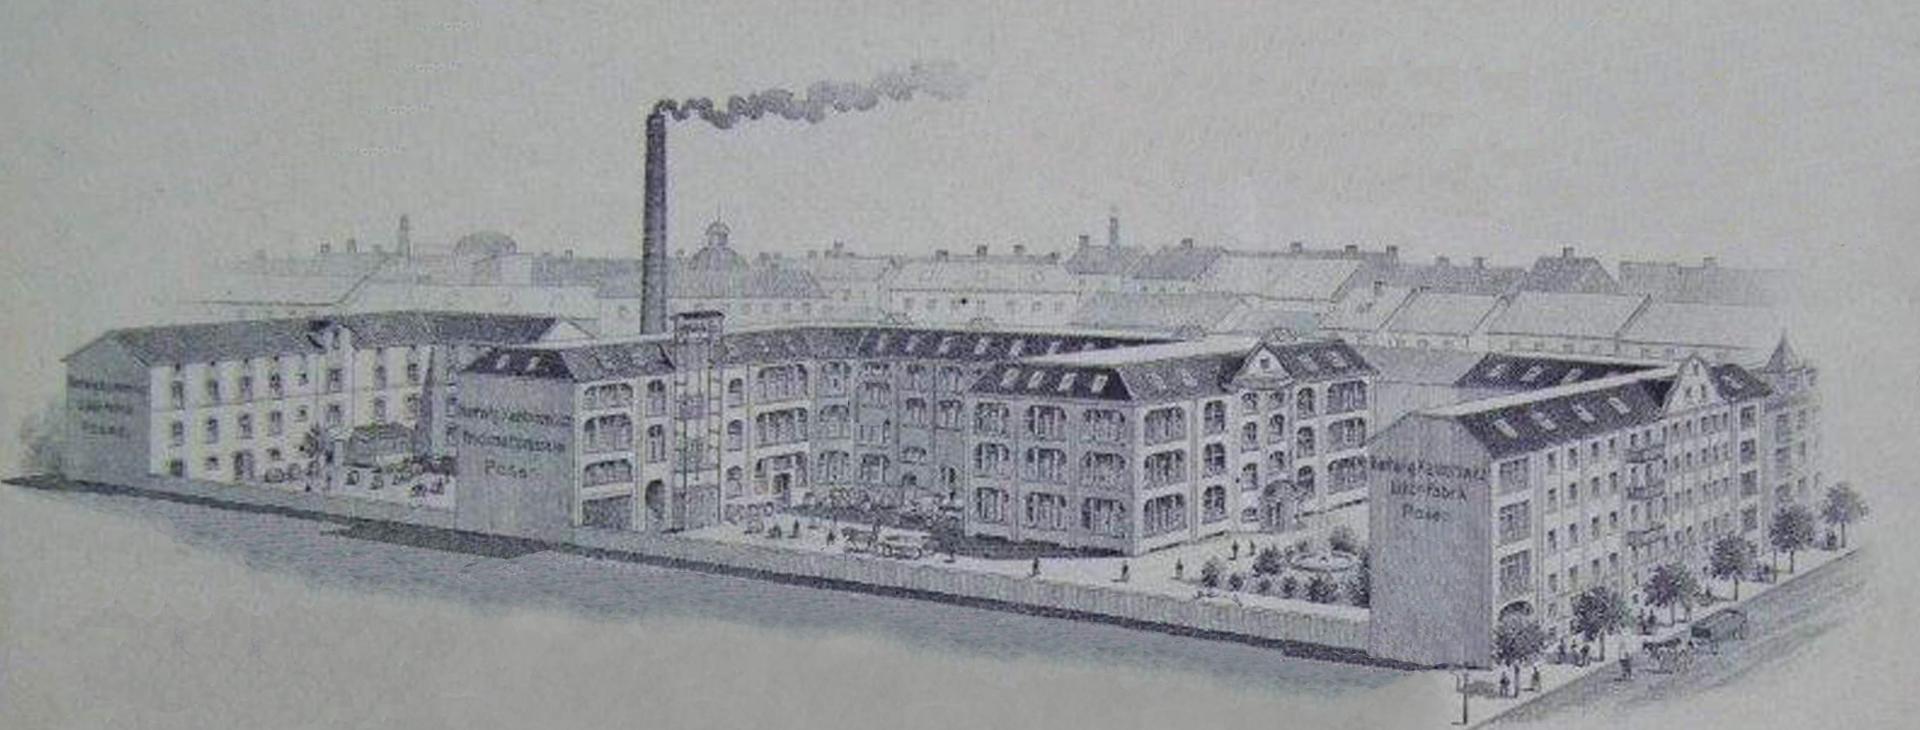 Kantorowicz Fabrikkomplex, ©Stephan Becker, Brüssow